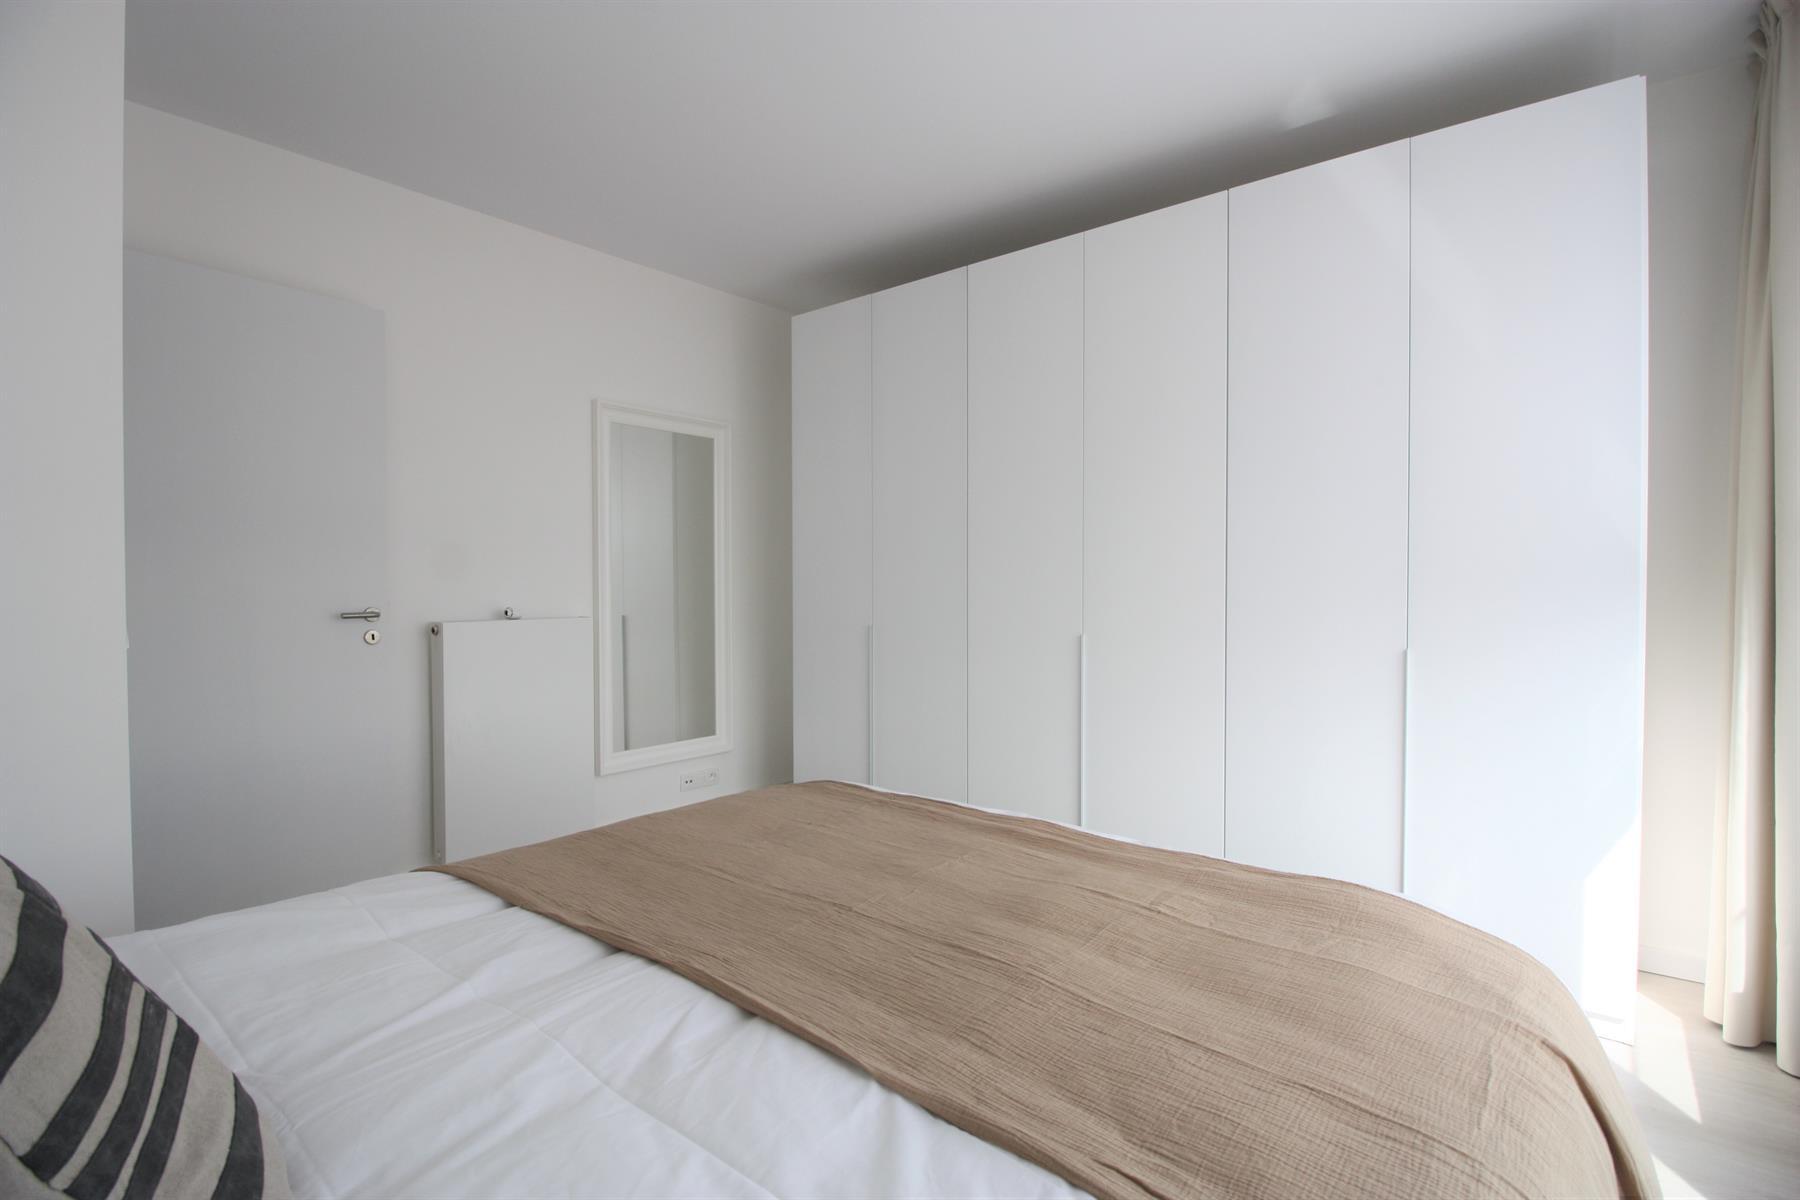 Appartement - Woluwe-Saint-Lambert - #4395355-18